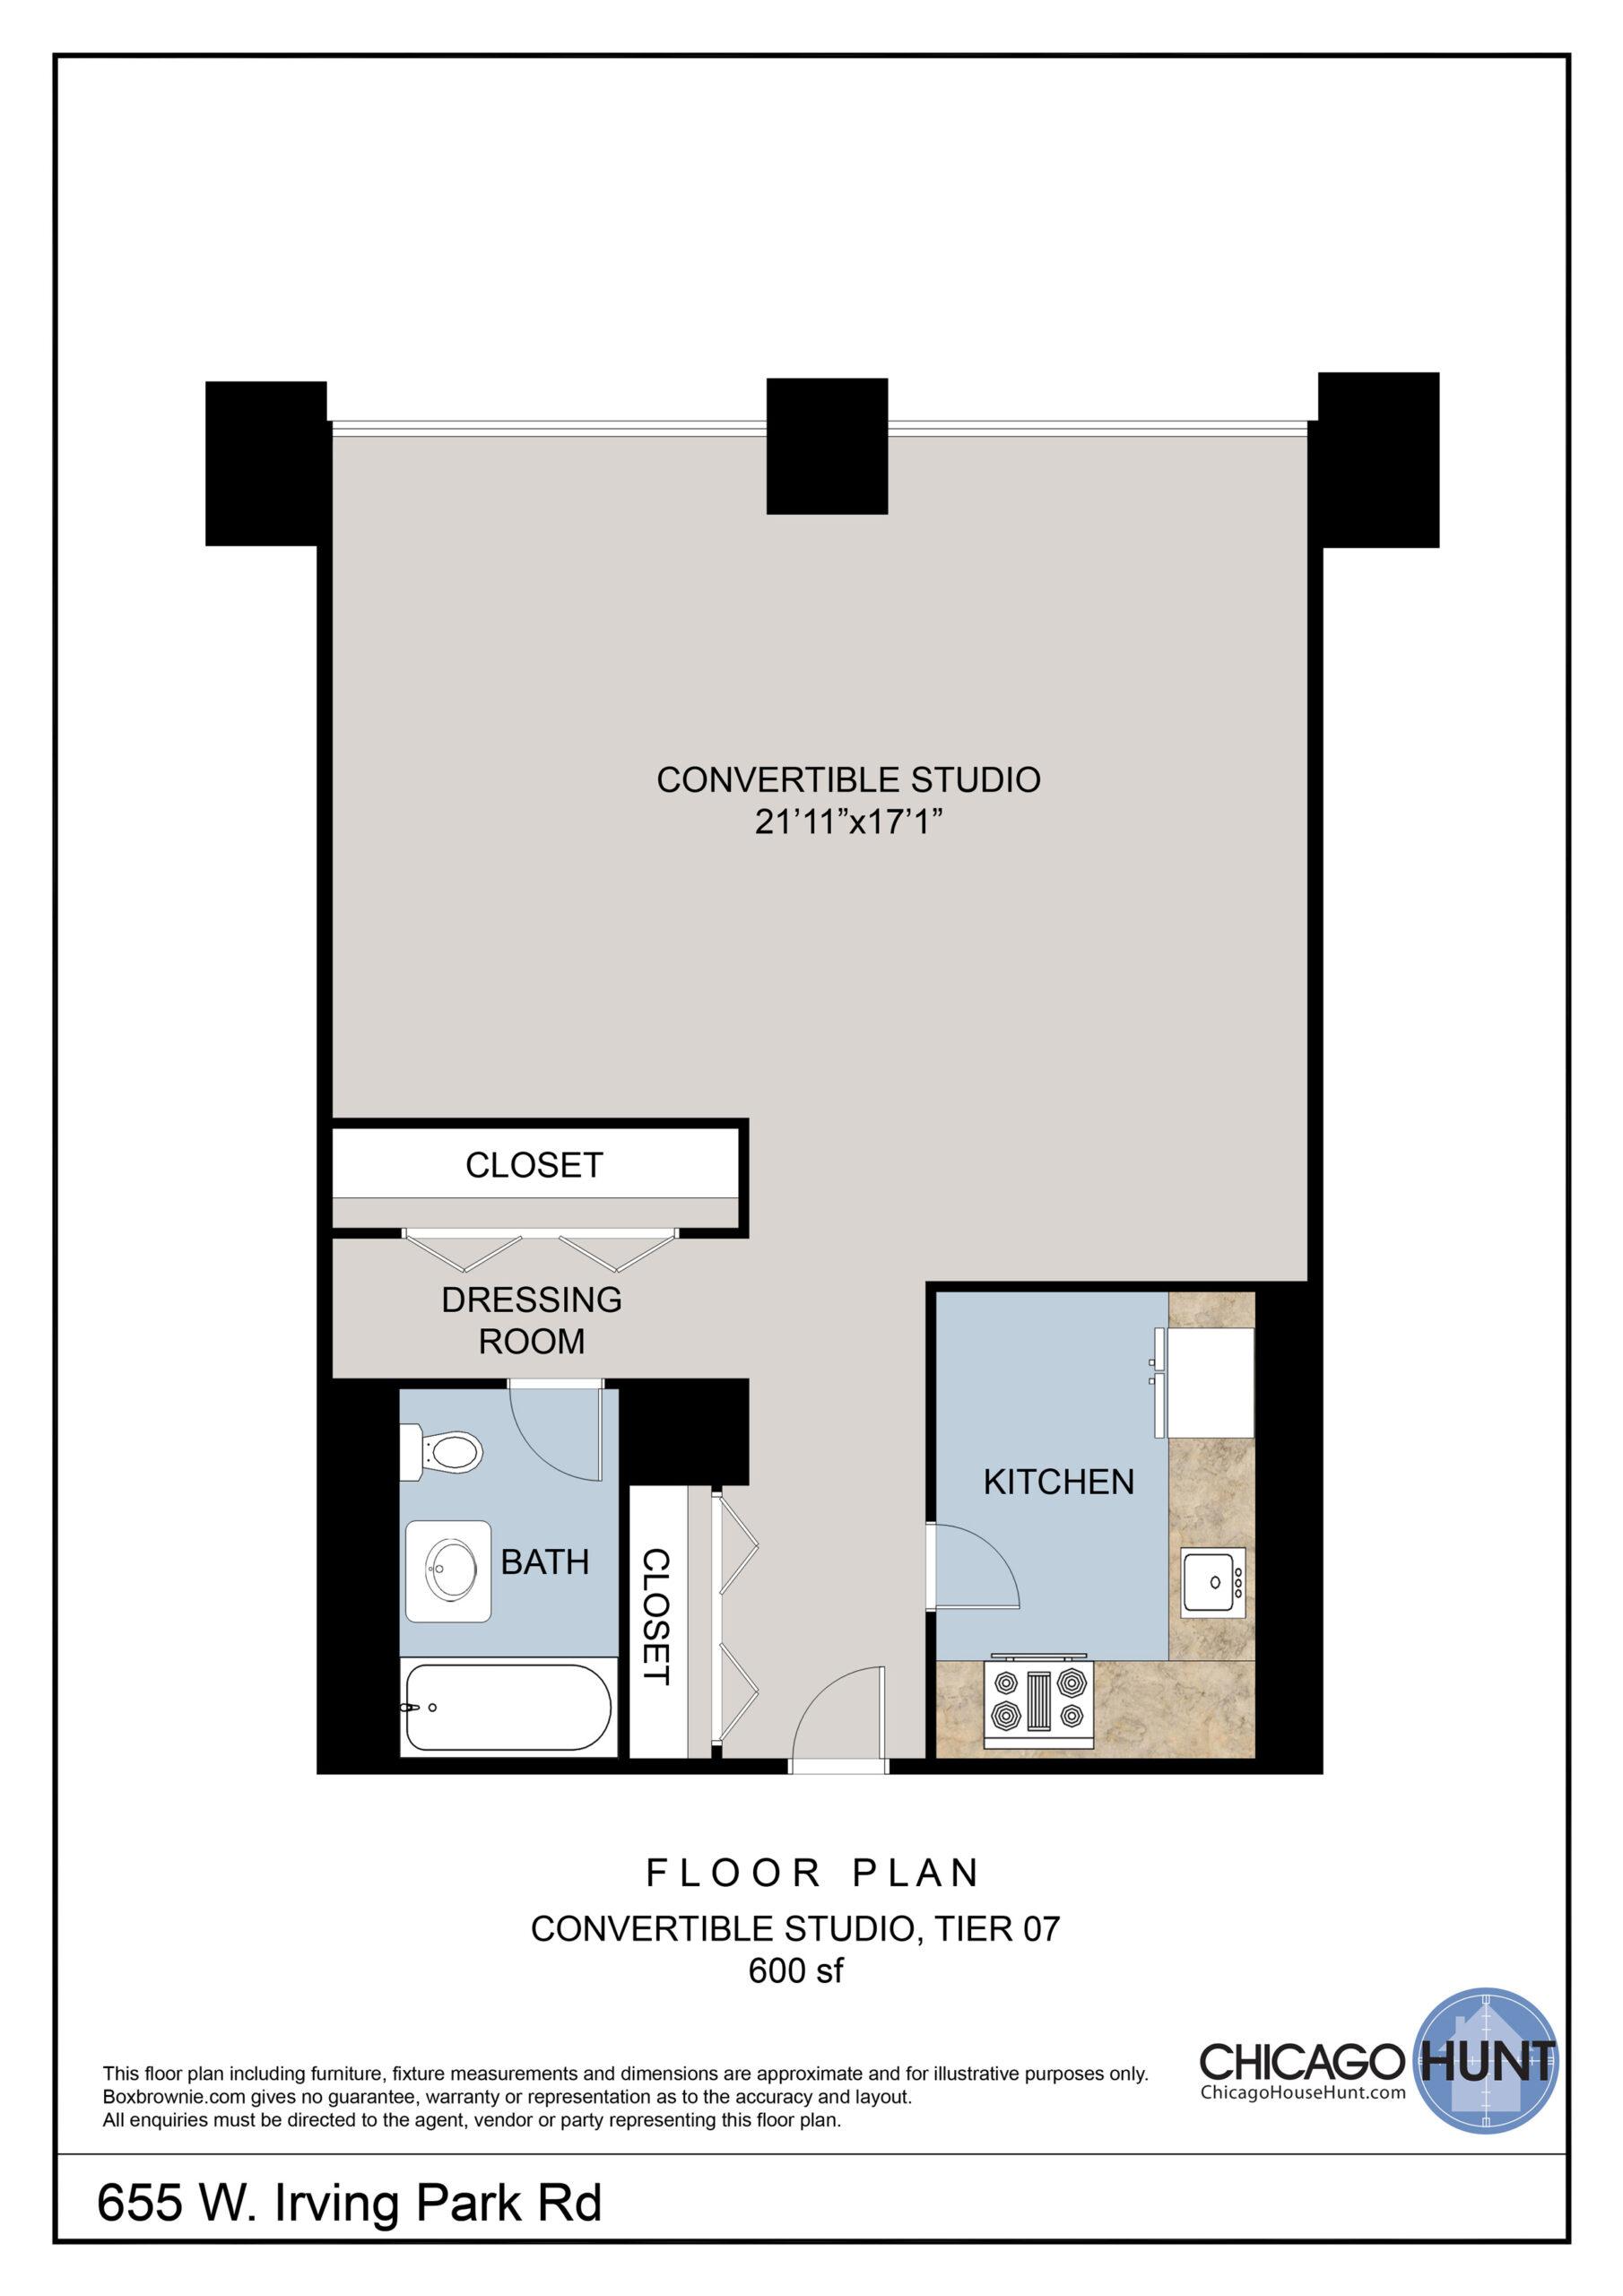 655 Irving Park, Park Place Tower - Floor Plan - Tier 07